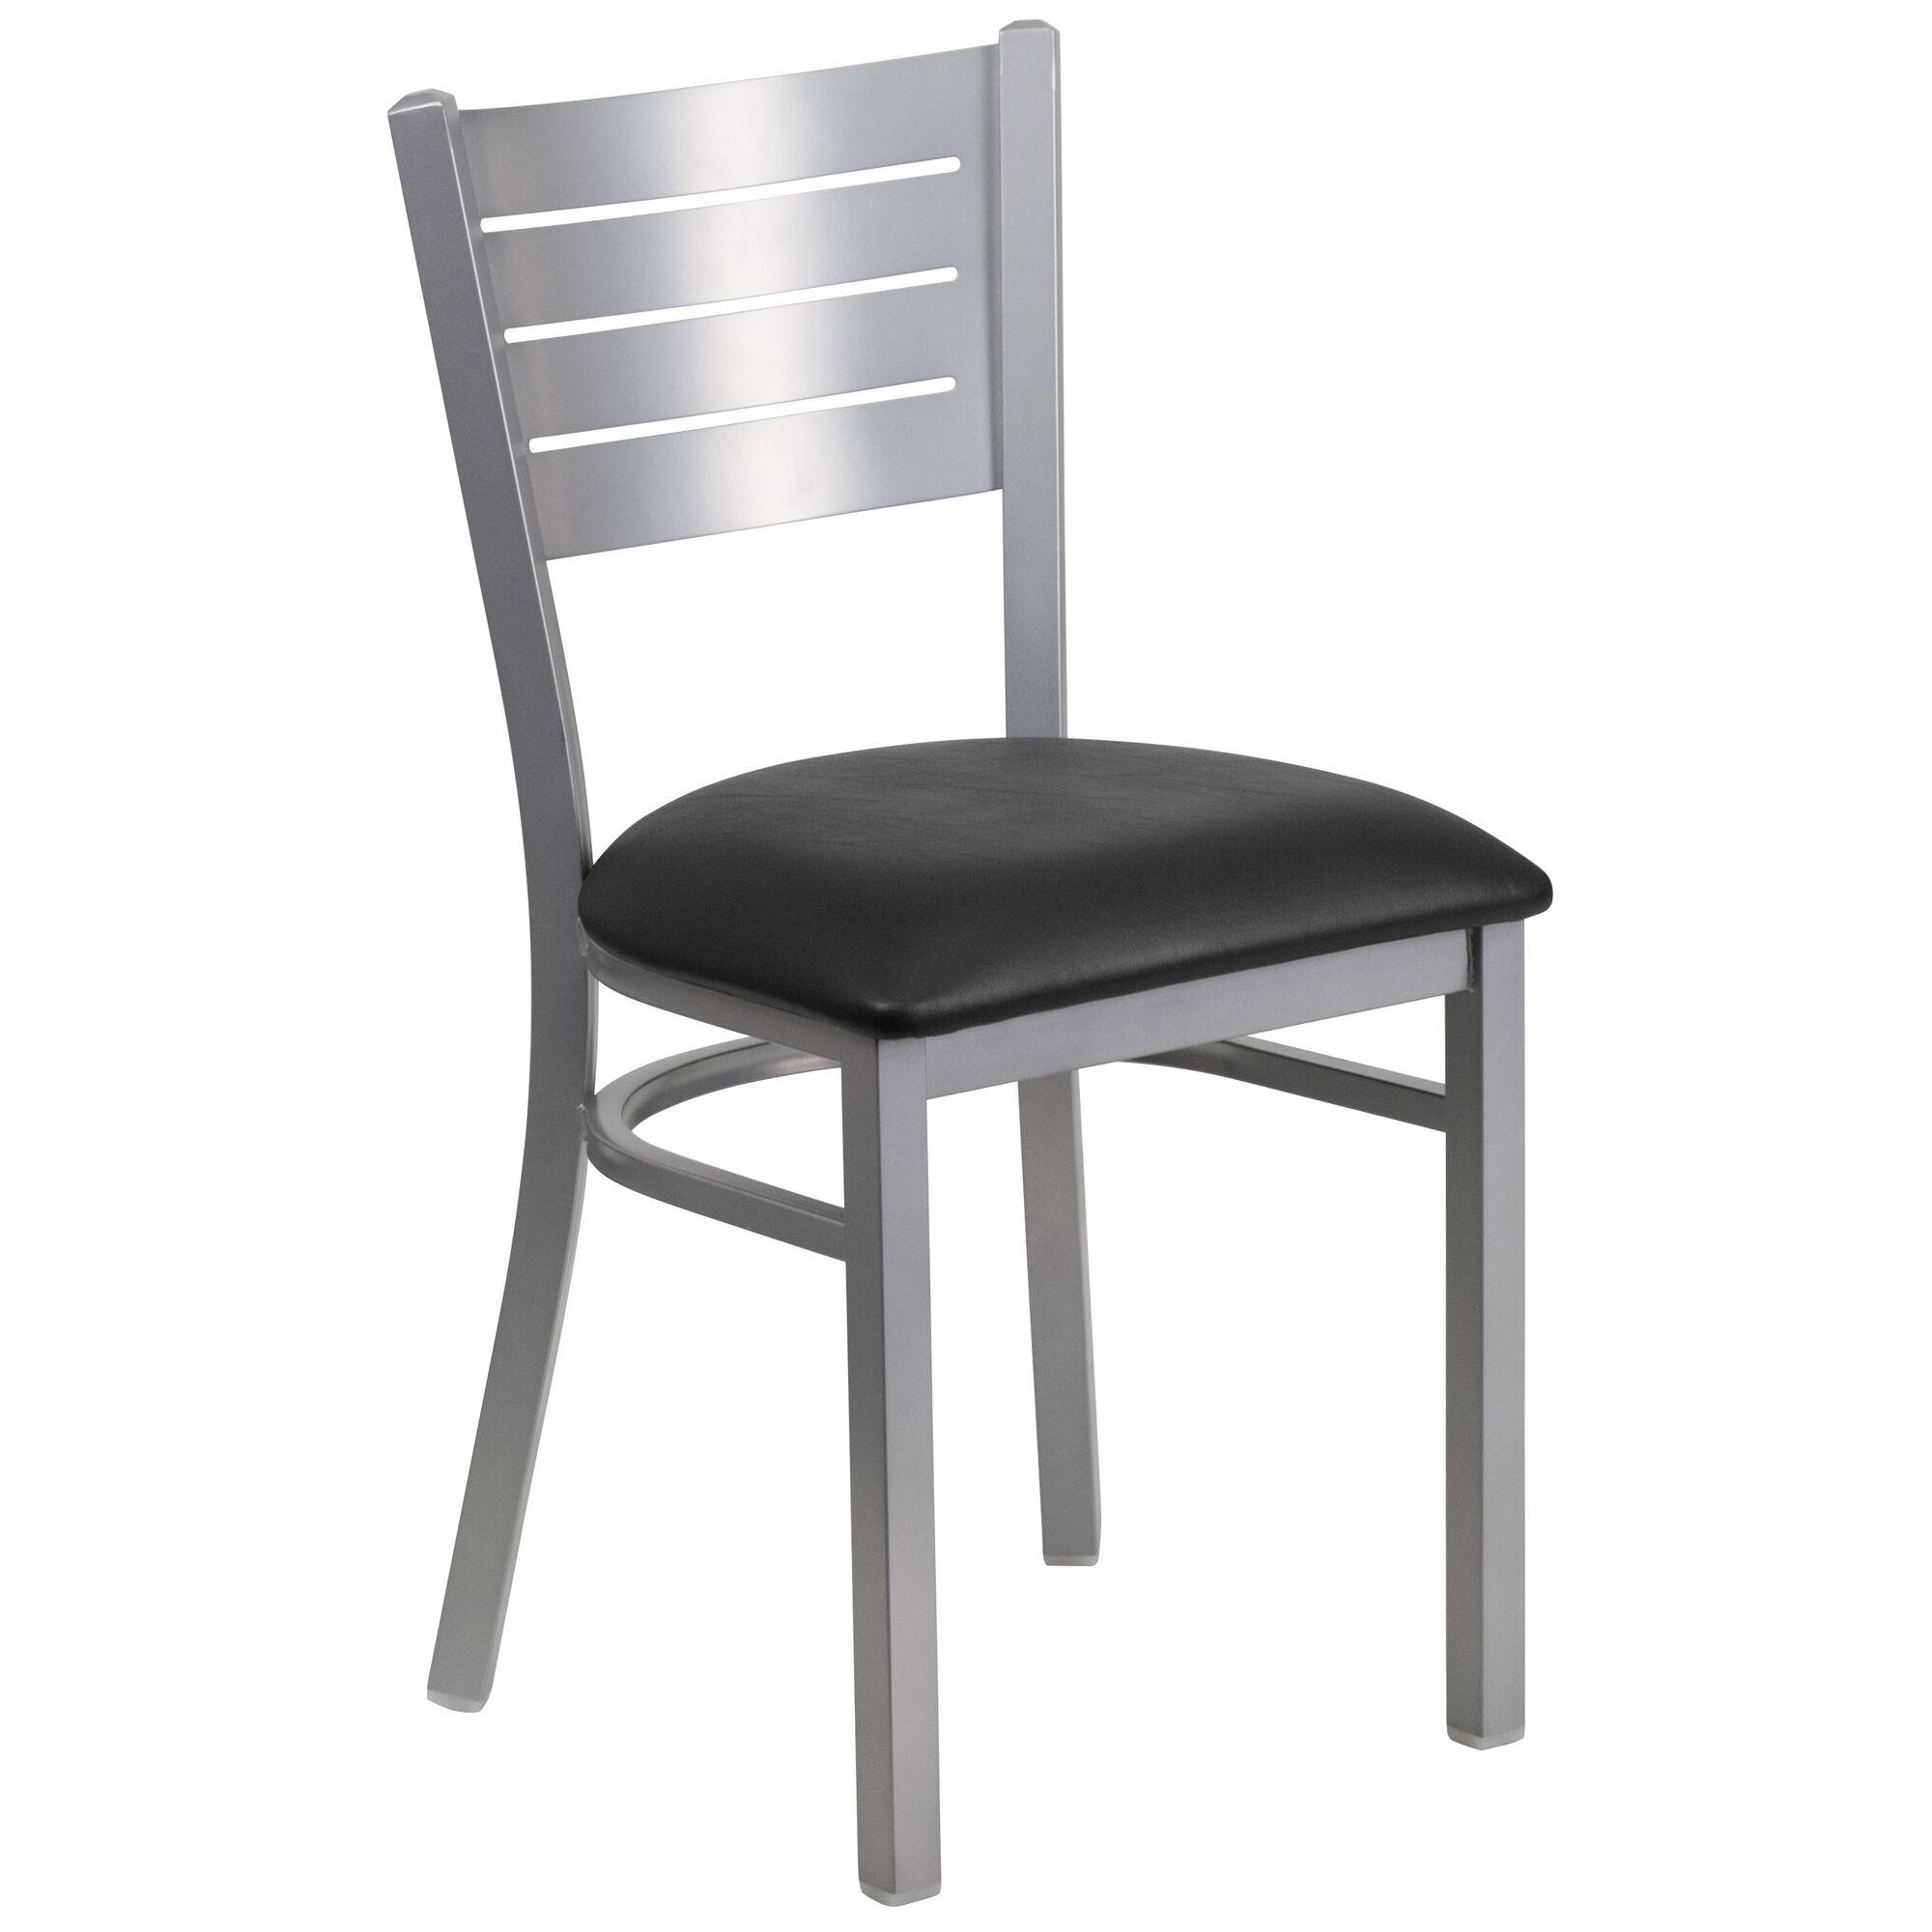 Silver slat chair black seat bfdh slv bk tdr